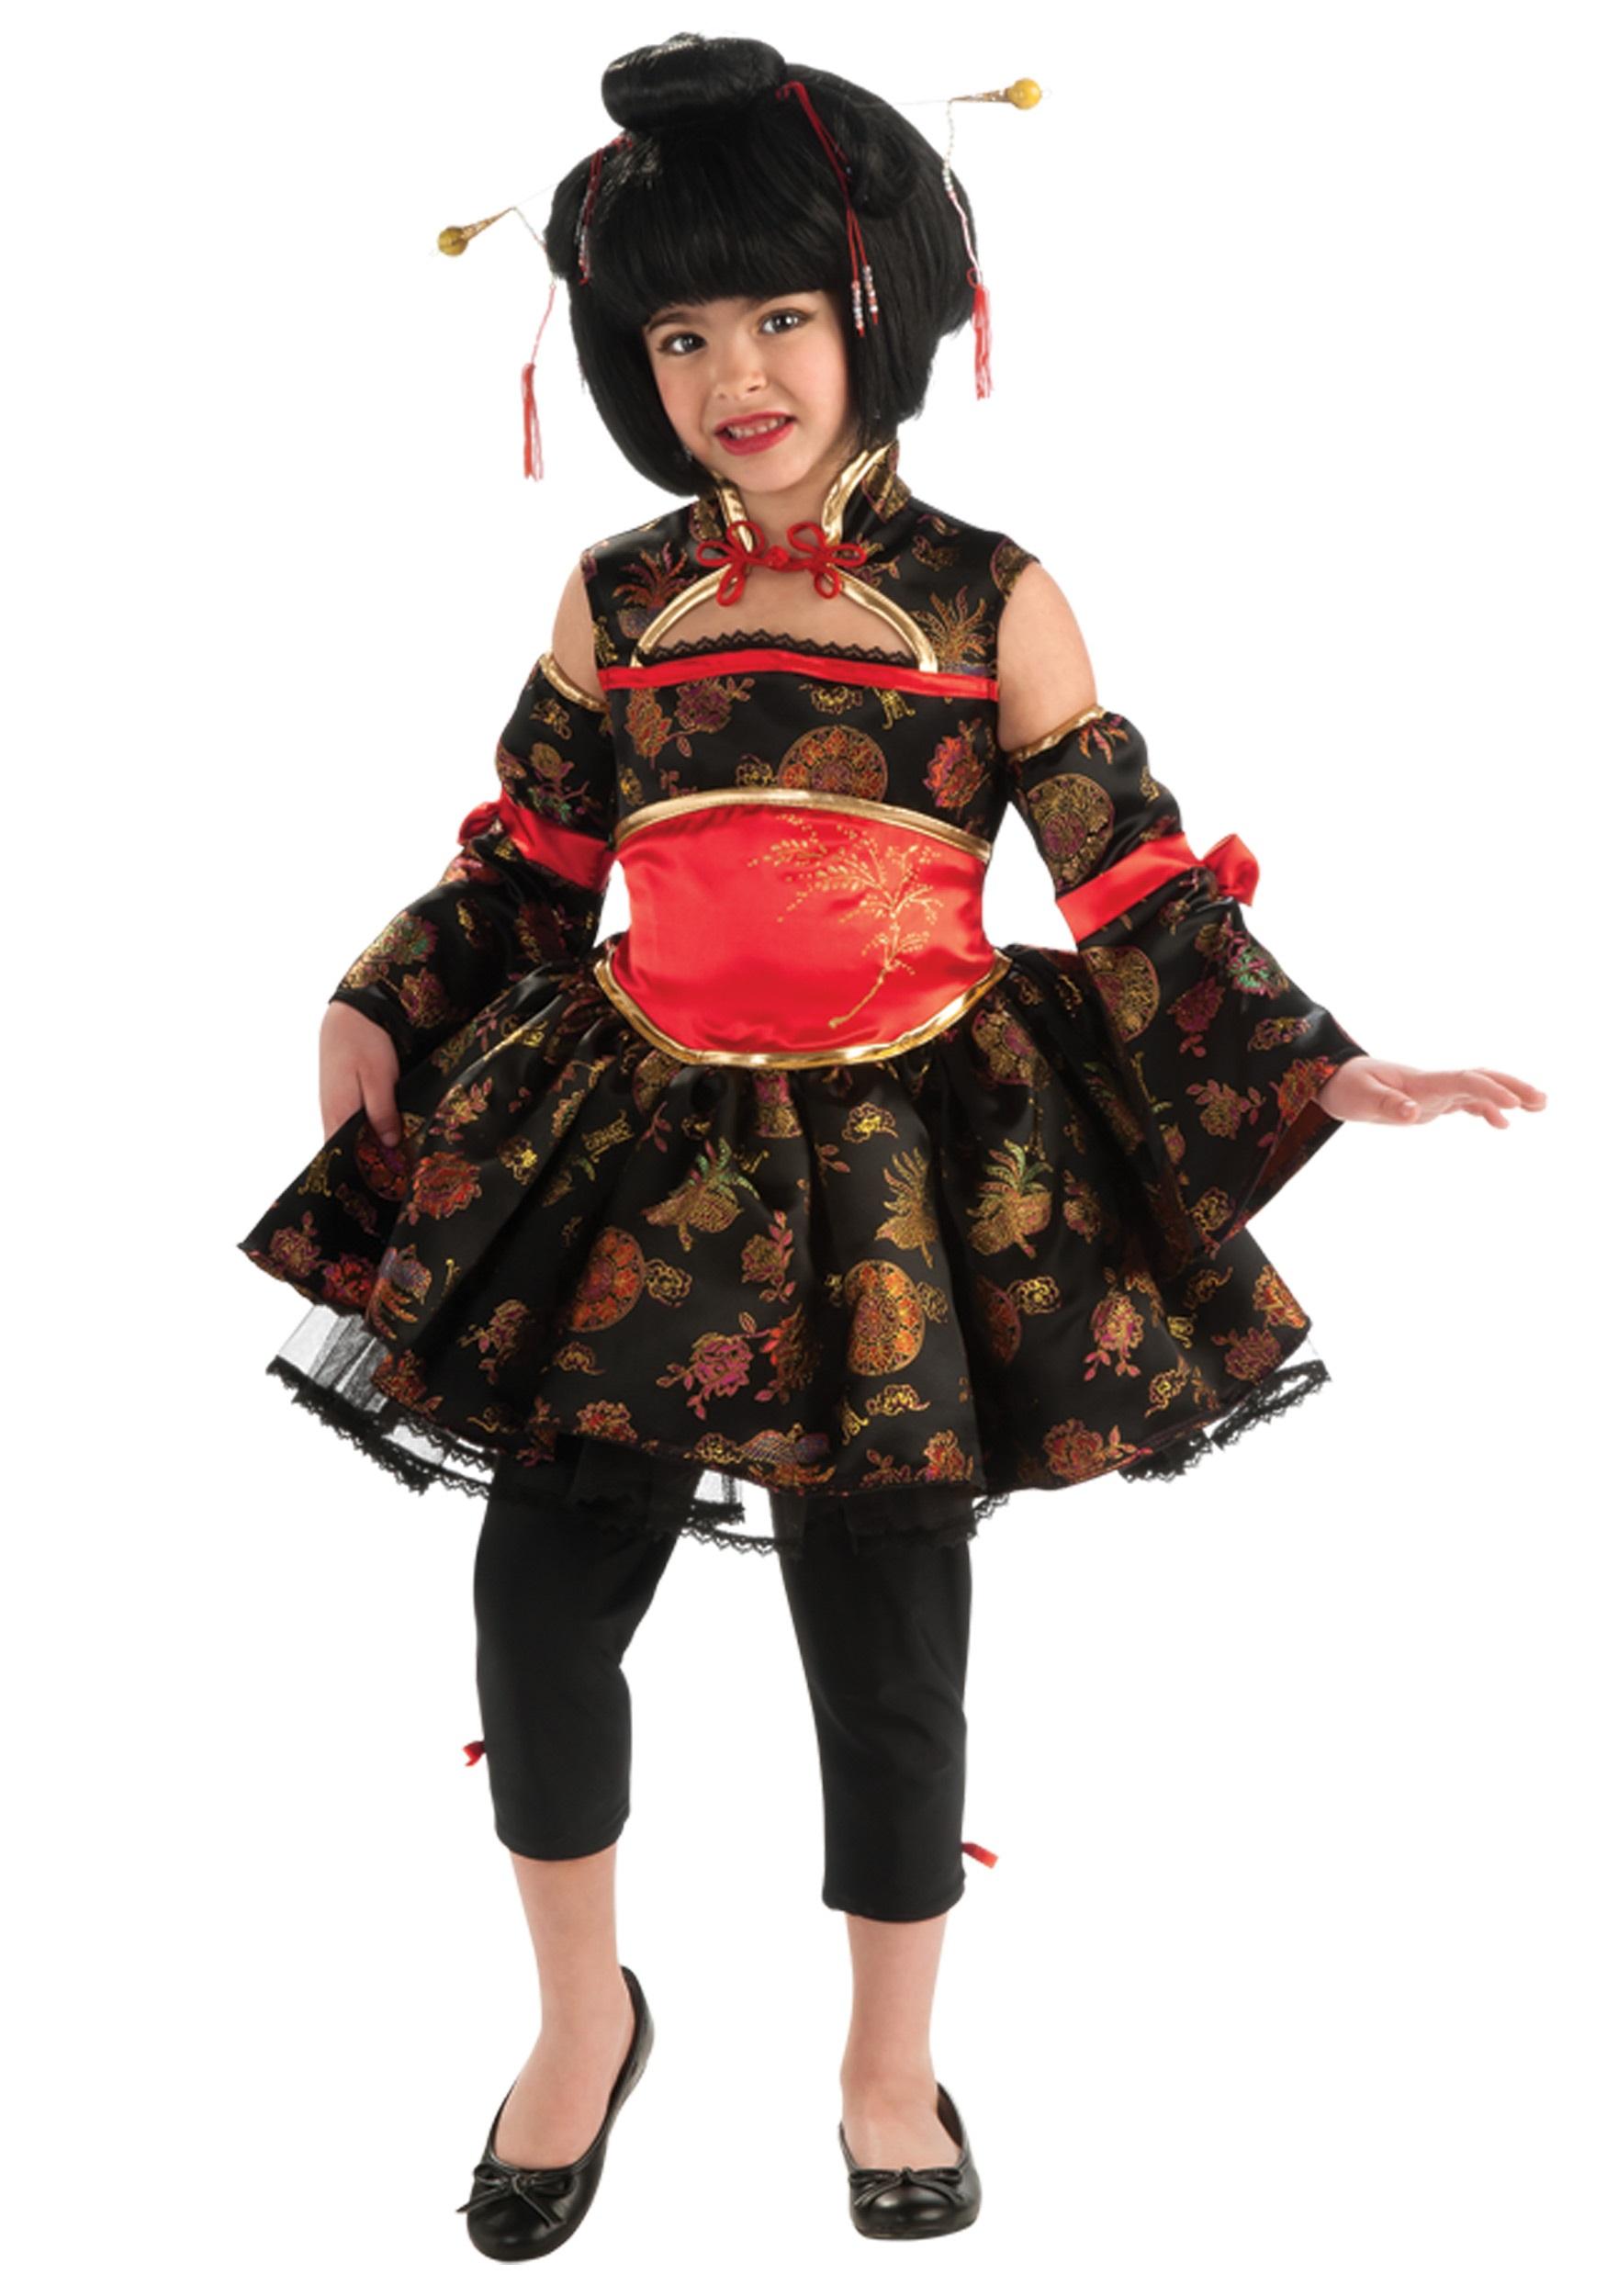 Child Little Geisha Costume  sc 1 st  Halloween Costumes & Child Little Geisha Costume - Halloween Costumes